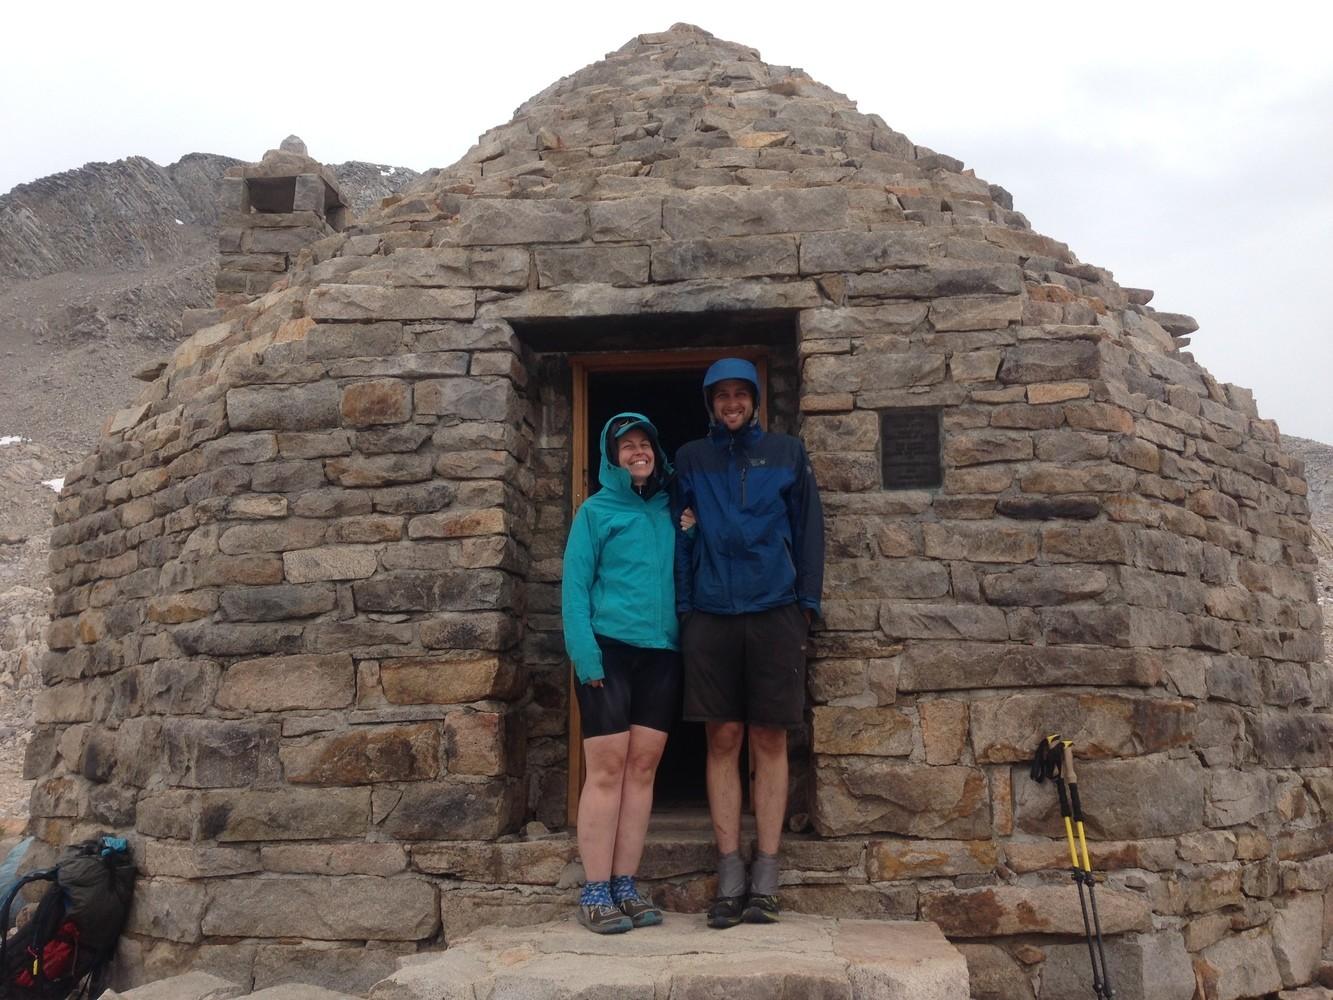 Tester Tiffany Searsdodd (on left) takes the Marmot Minimalist on the John Muir Trail.   Photo courtesy Tiffany Searsdodd